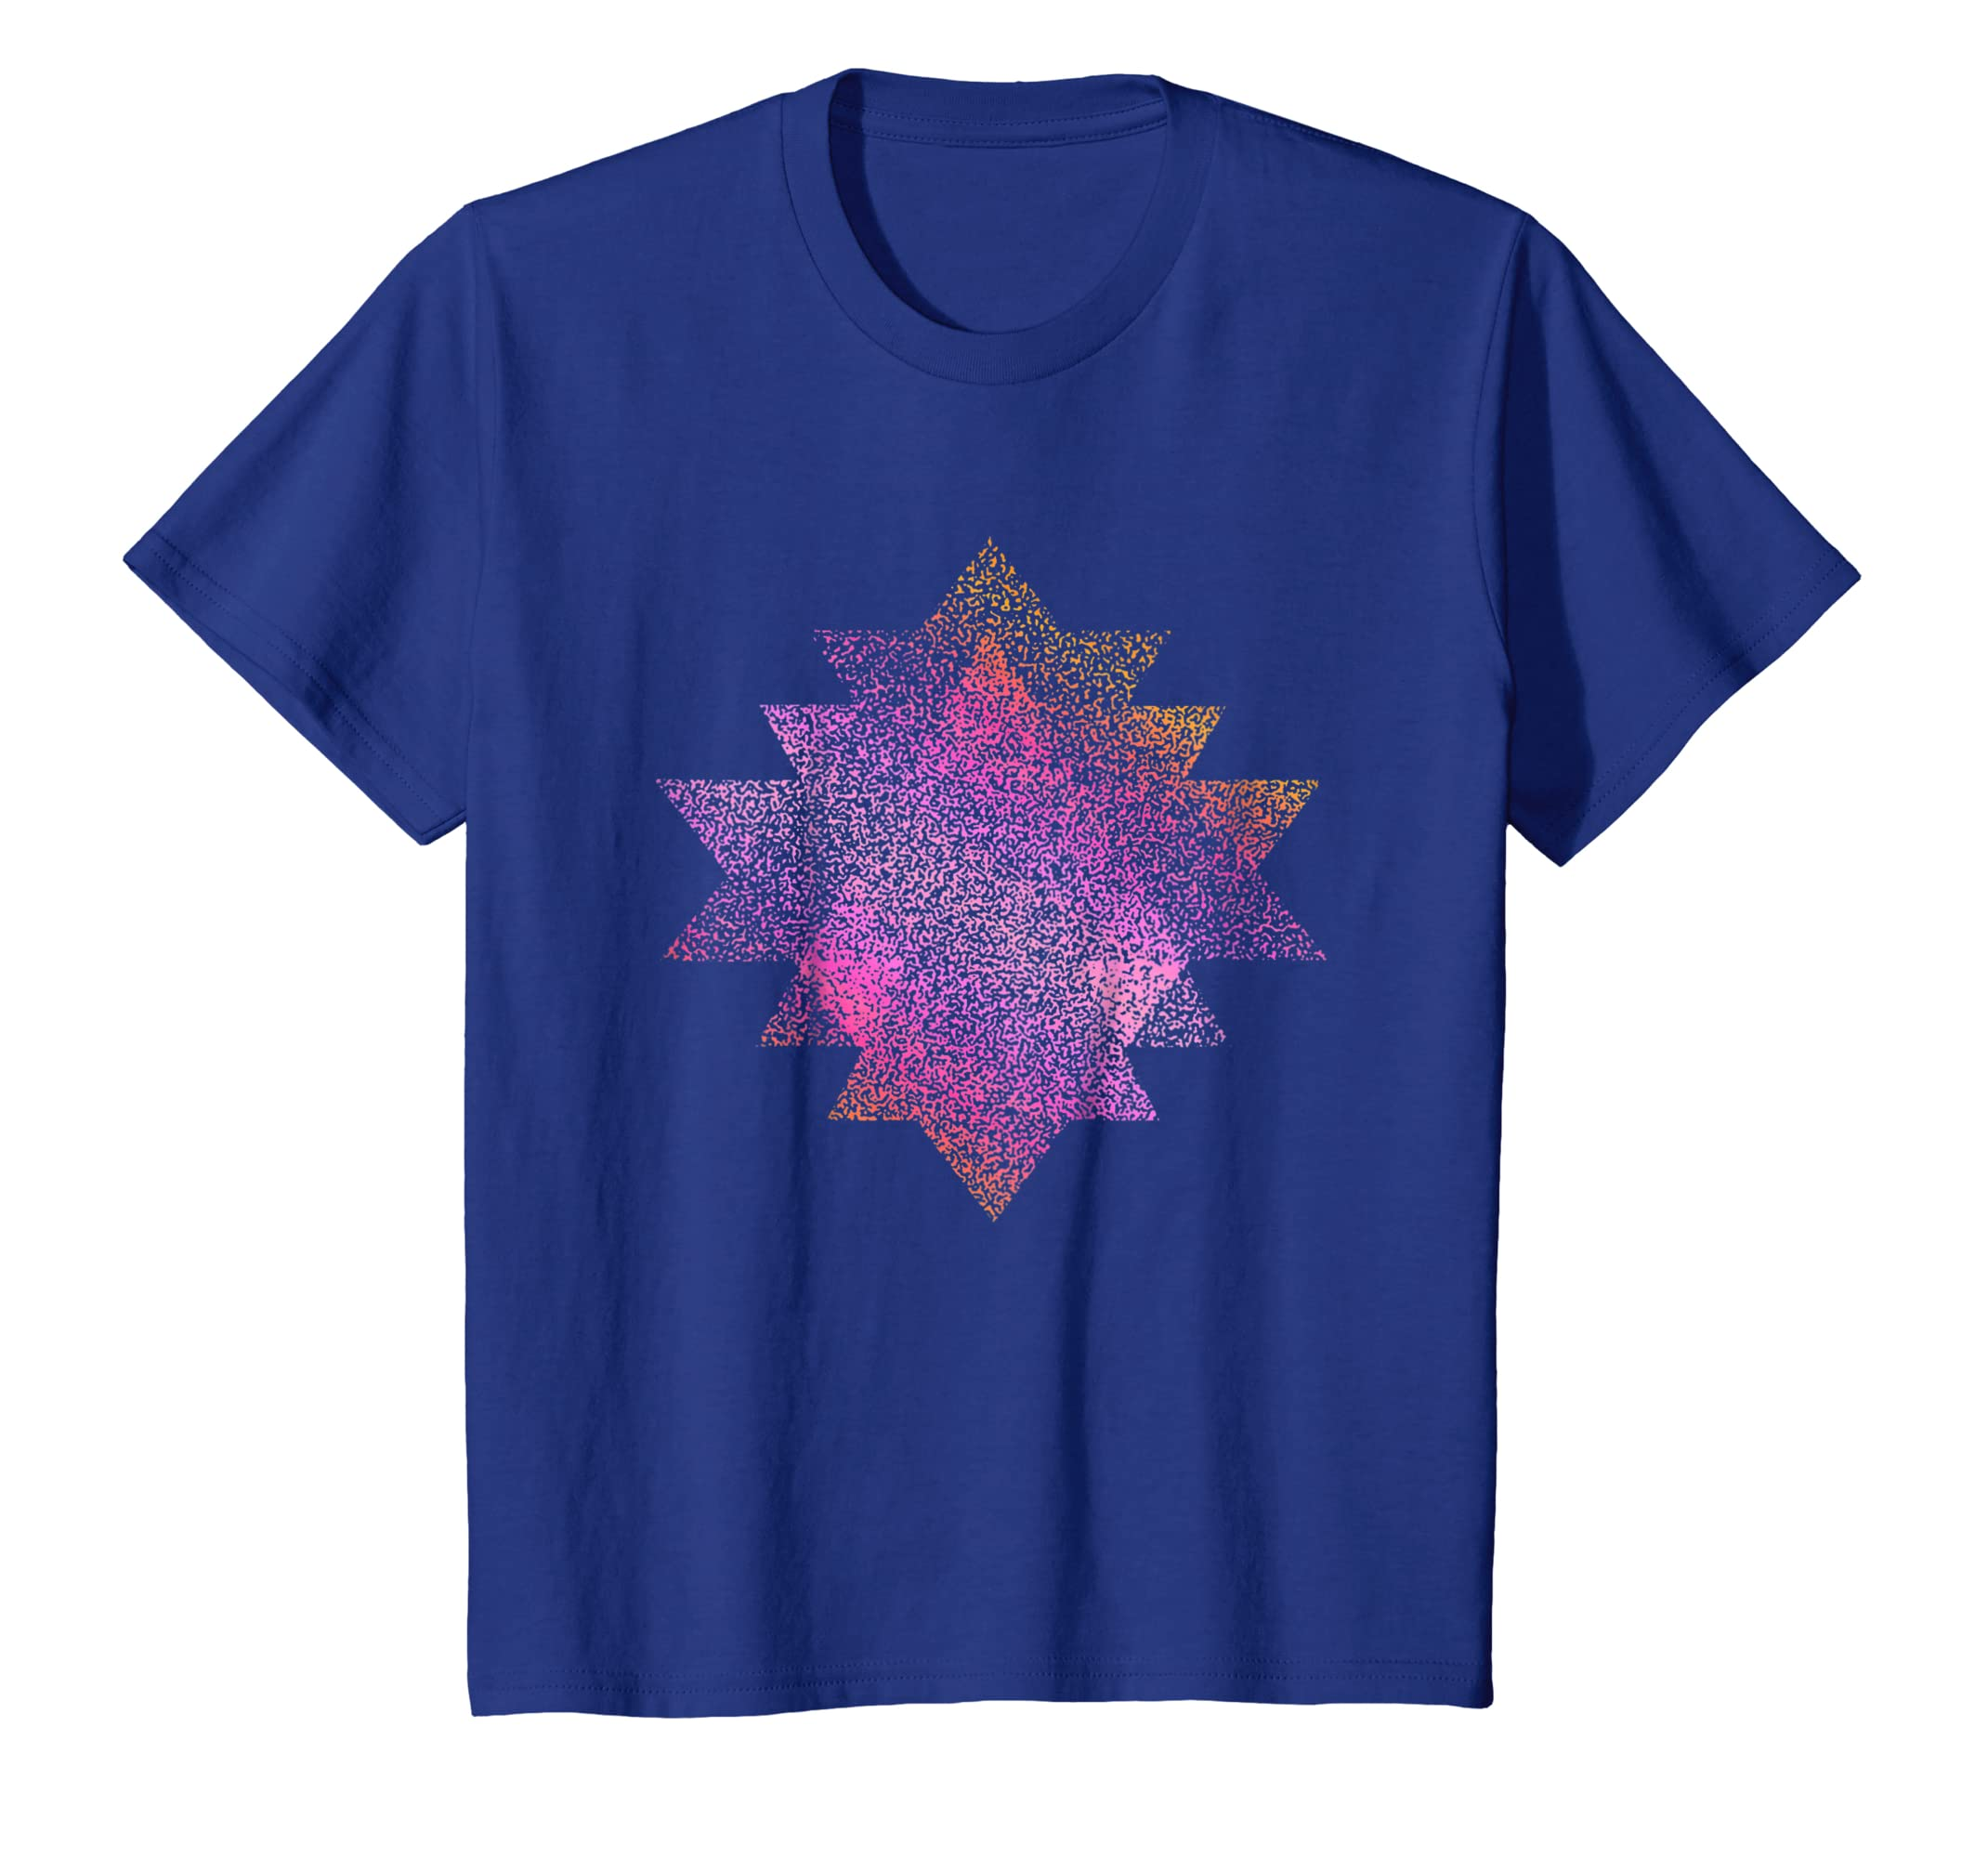 Amazon.com: Sri Yantra Yoga Tshirt - Meditation - Pink ...